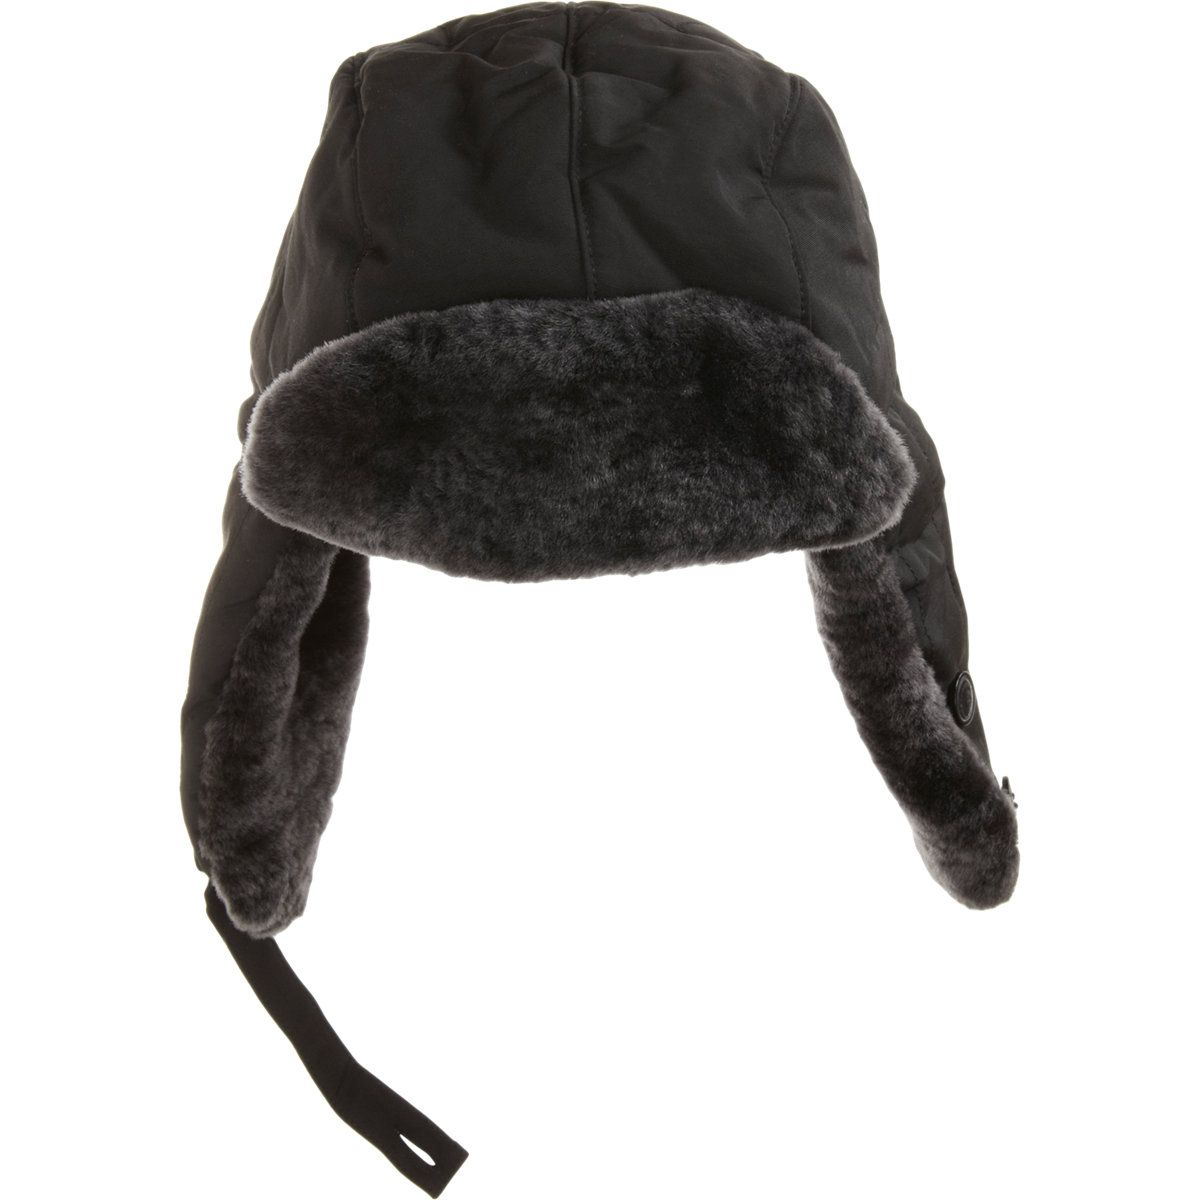 Woolrich Fur Trapper Hat in Black for Men - Lyst 5007e511f7a4